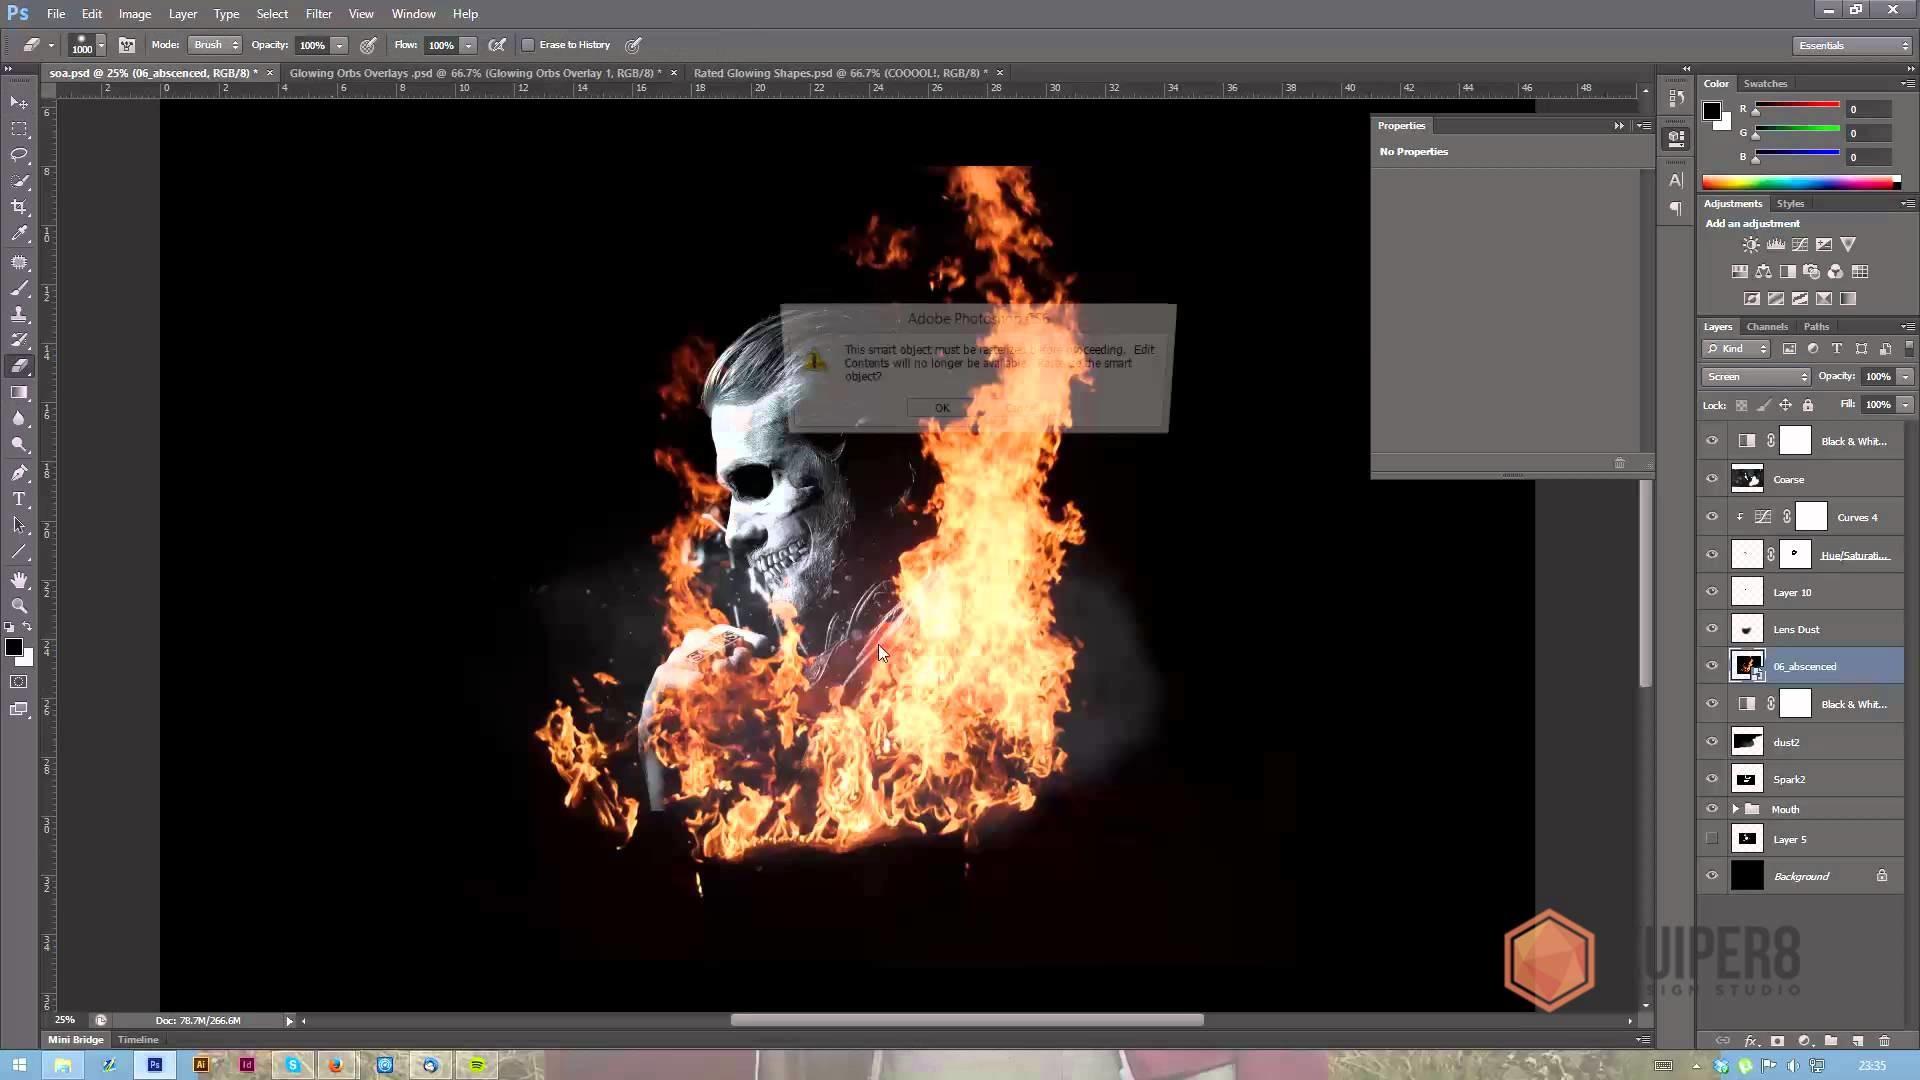 Jax Teller – Sons of Anarchy – Speedart – Kuiper8 Design Studio